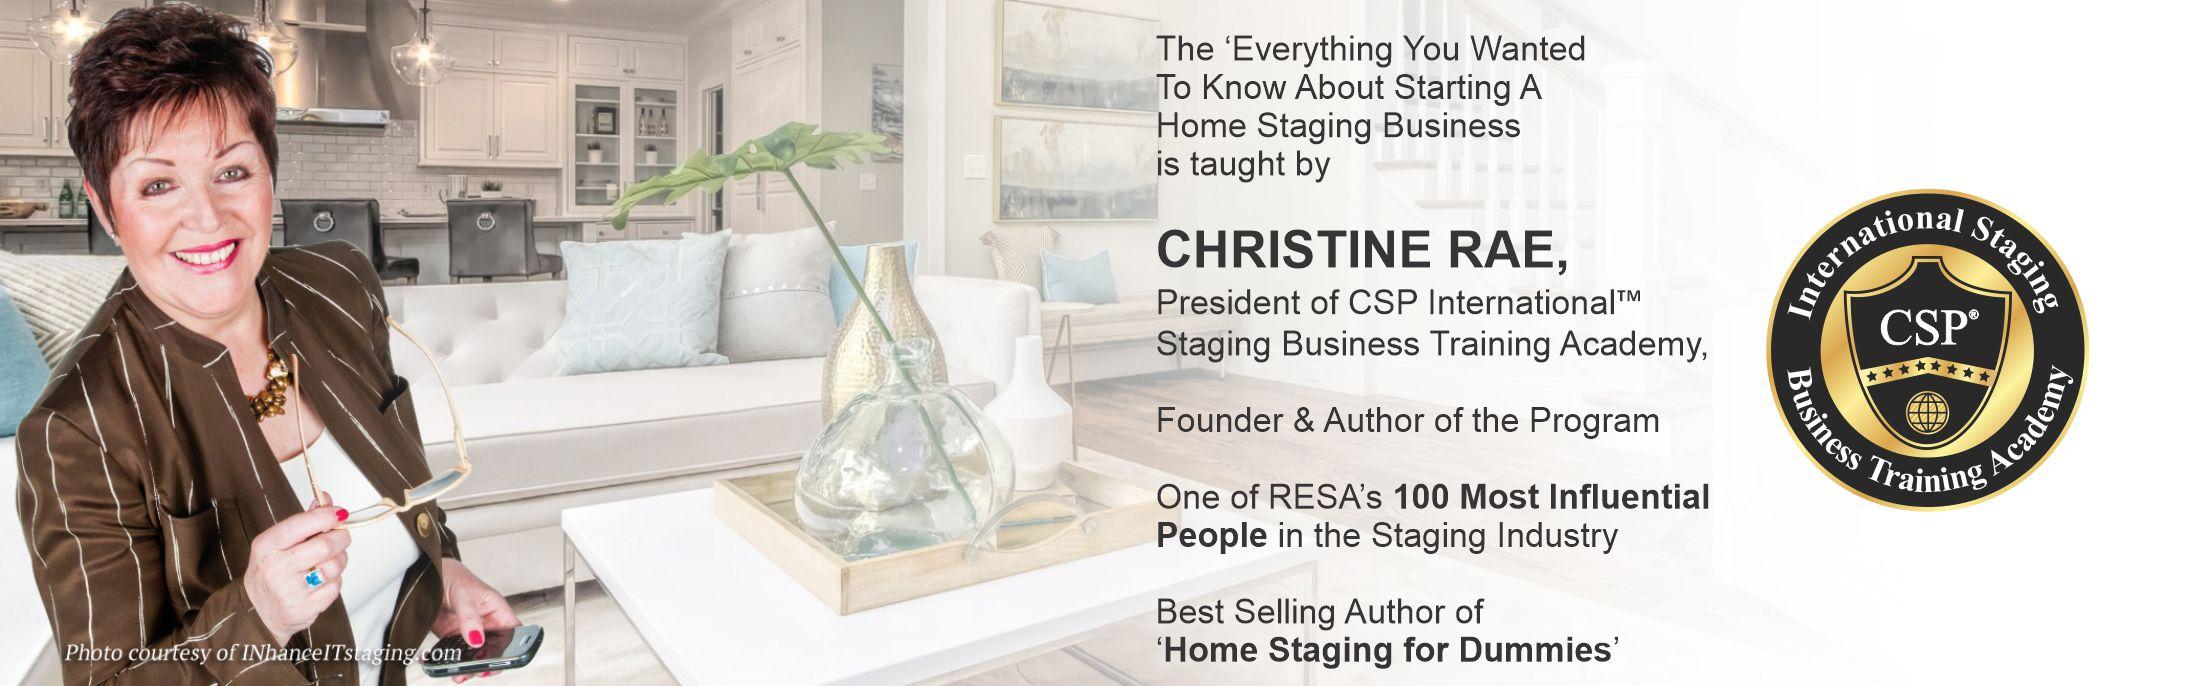 Christine Rae - and her brief bio